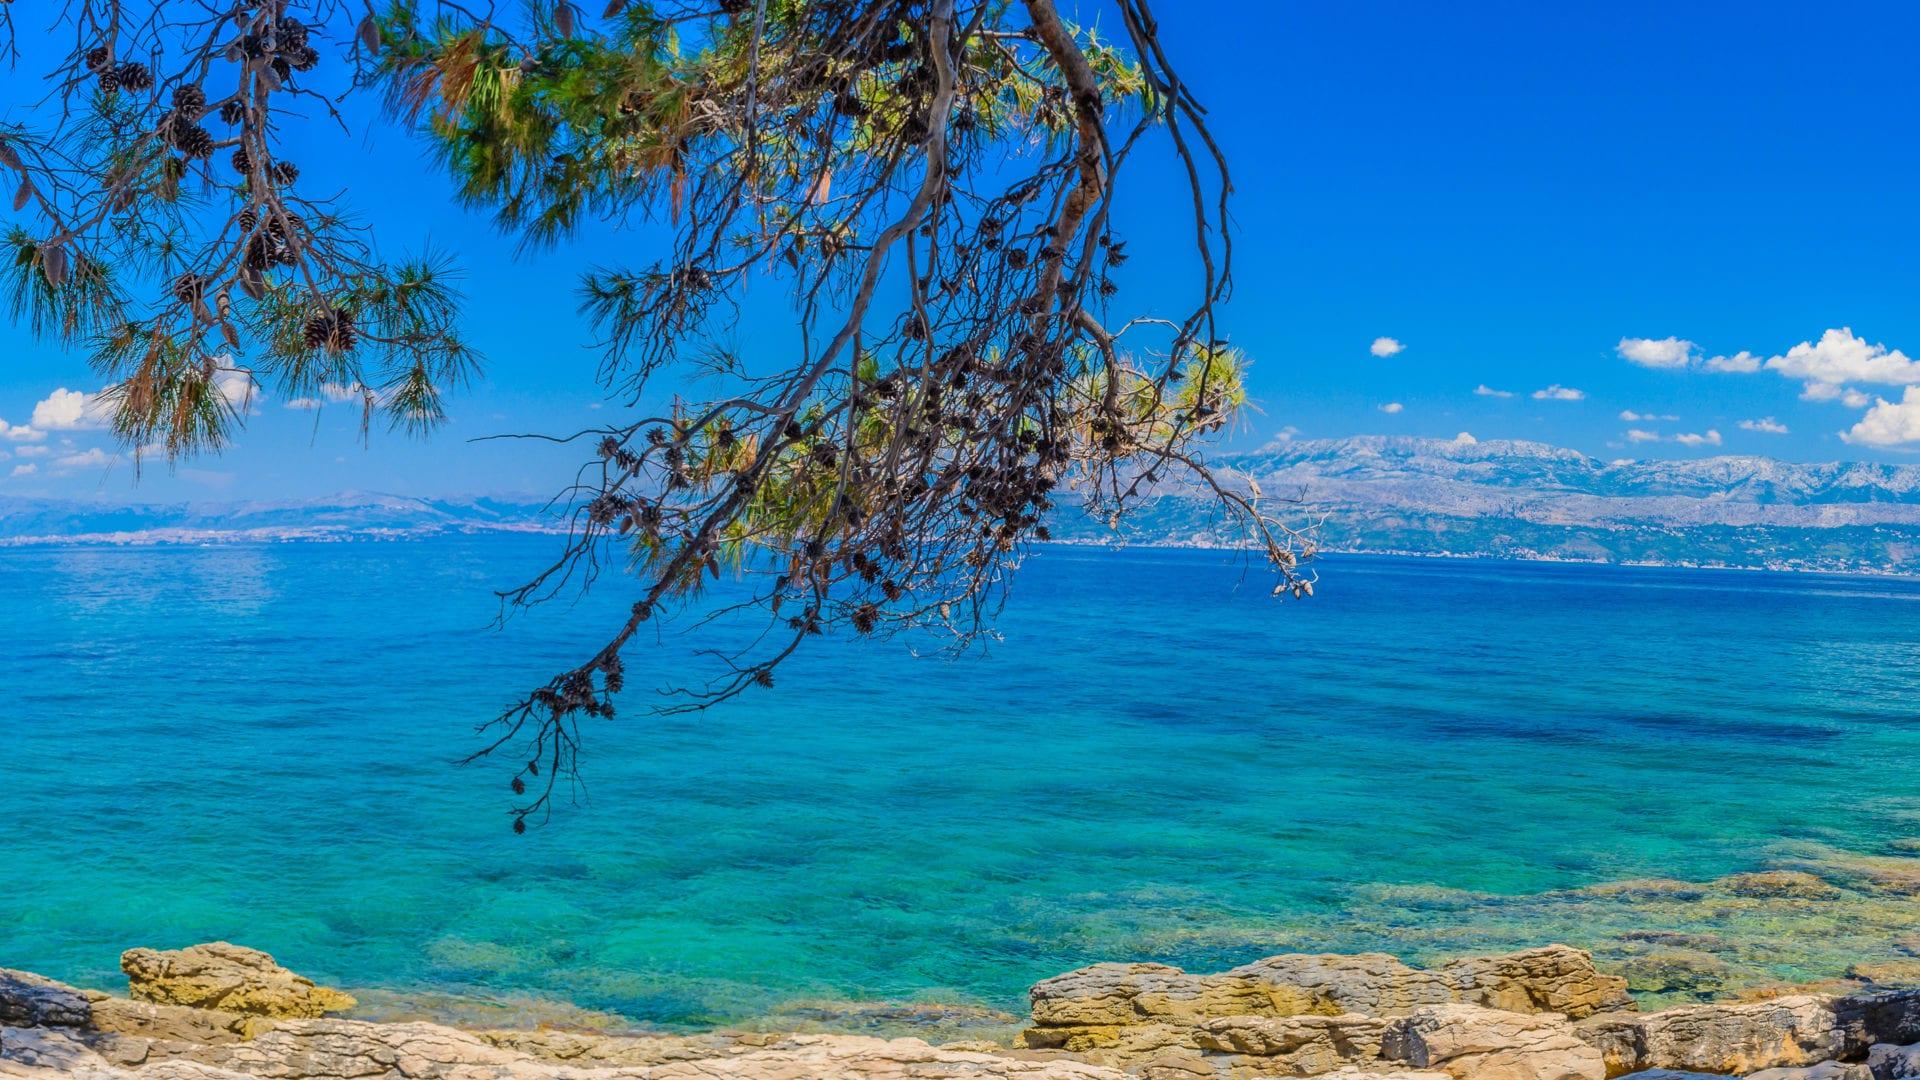 Kroatien - Übertrifft Tourismus Ziele 2021